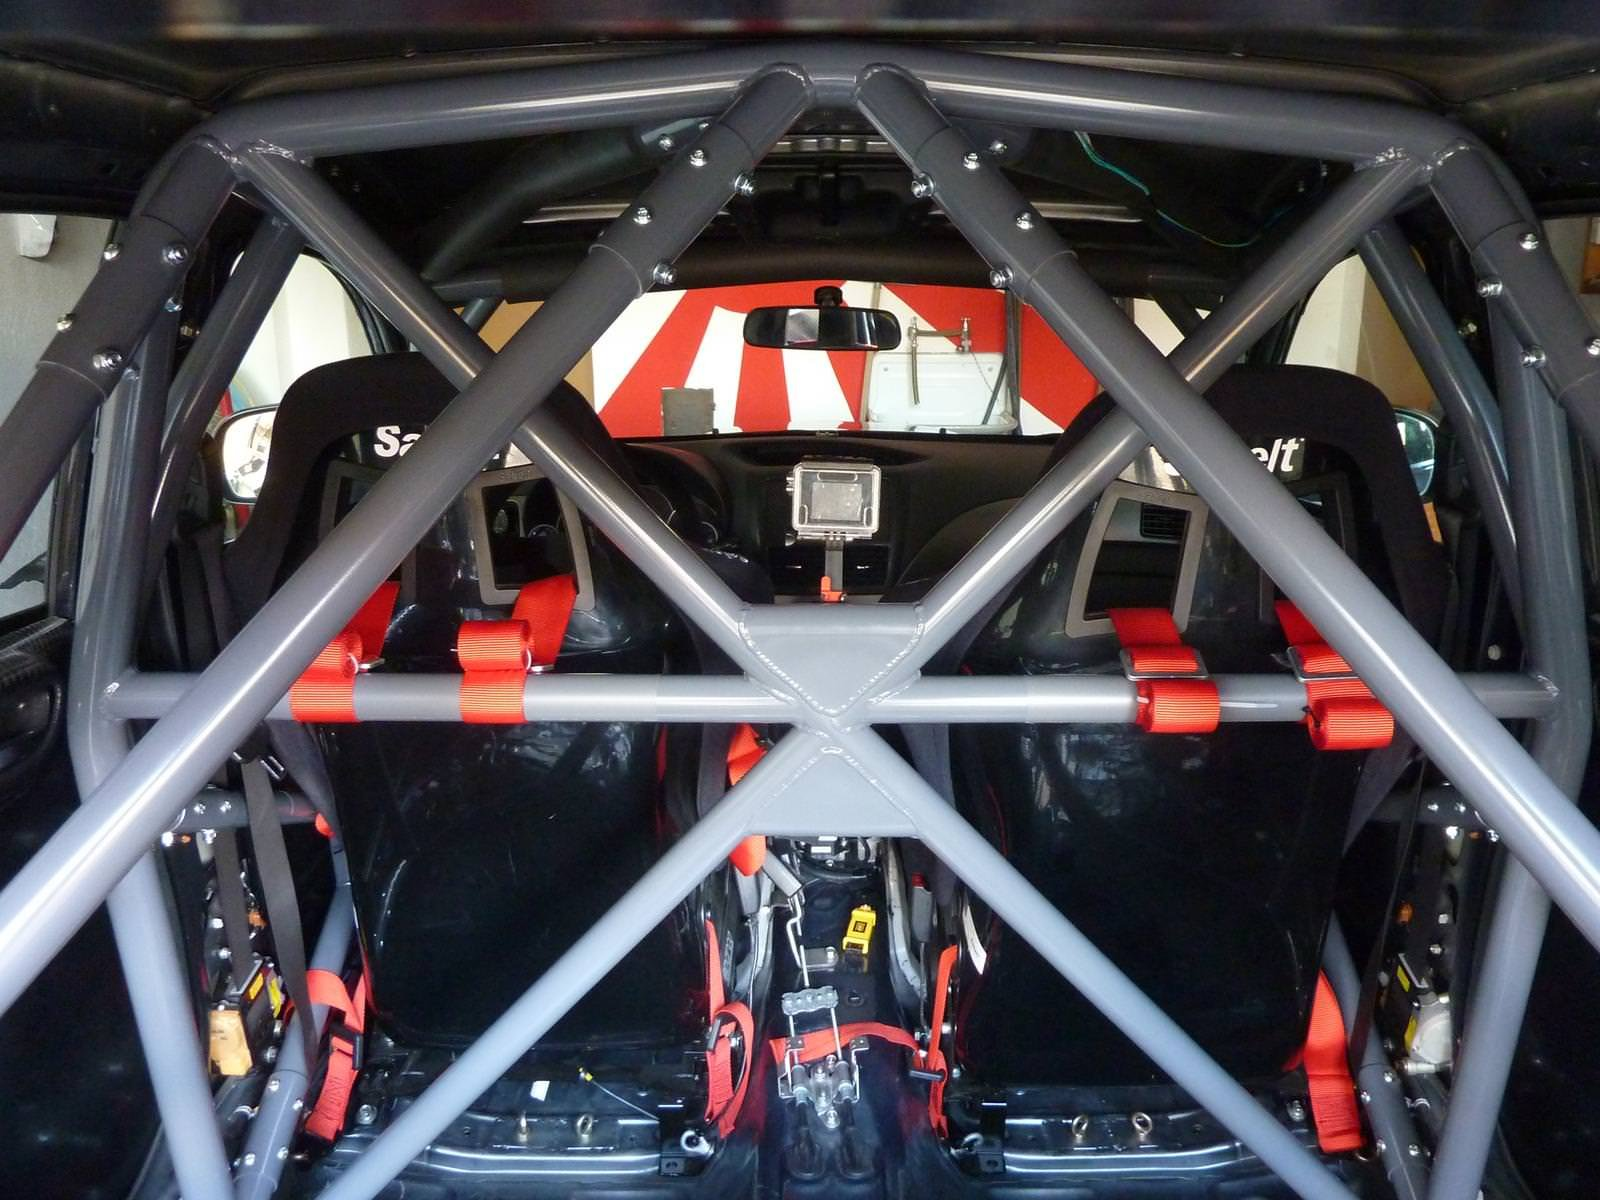 GR Hatch: - Dominik's 2008 EUDM STi Hatch - JDM EJ207 swap